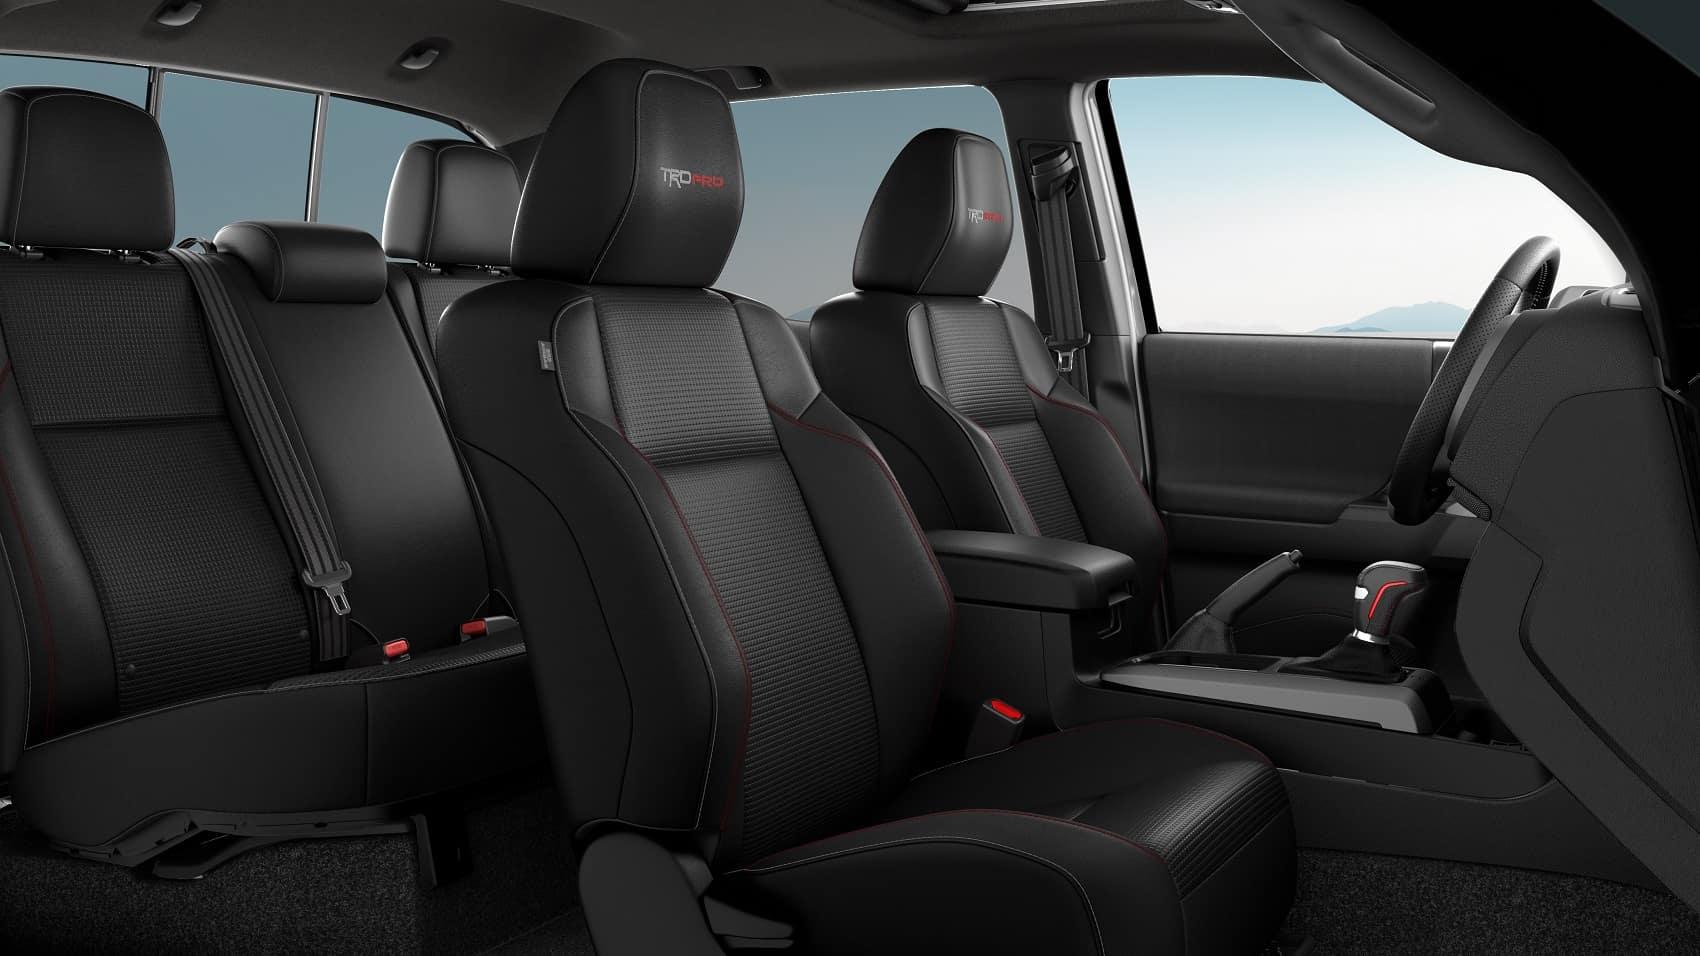 2020 Toyota Tacoma Interior Space